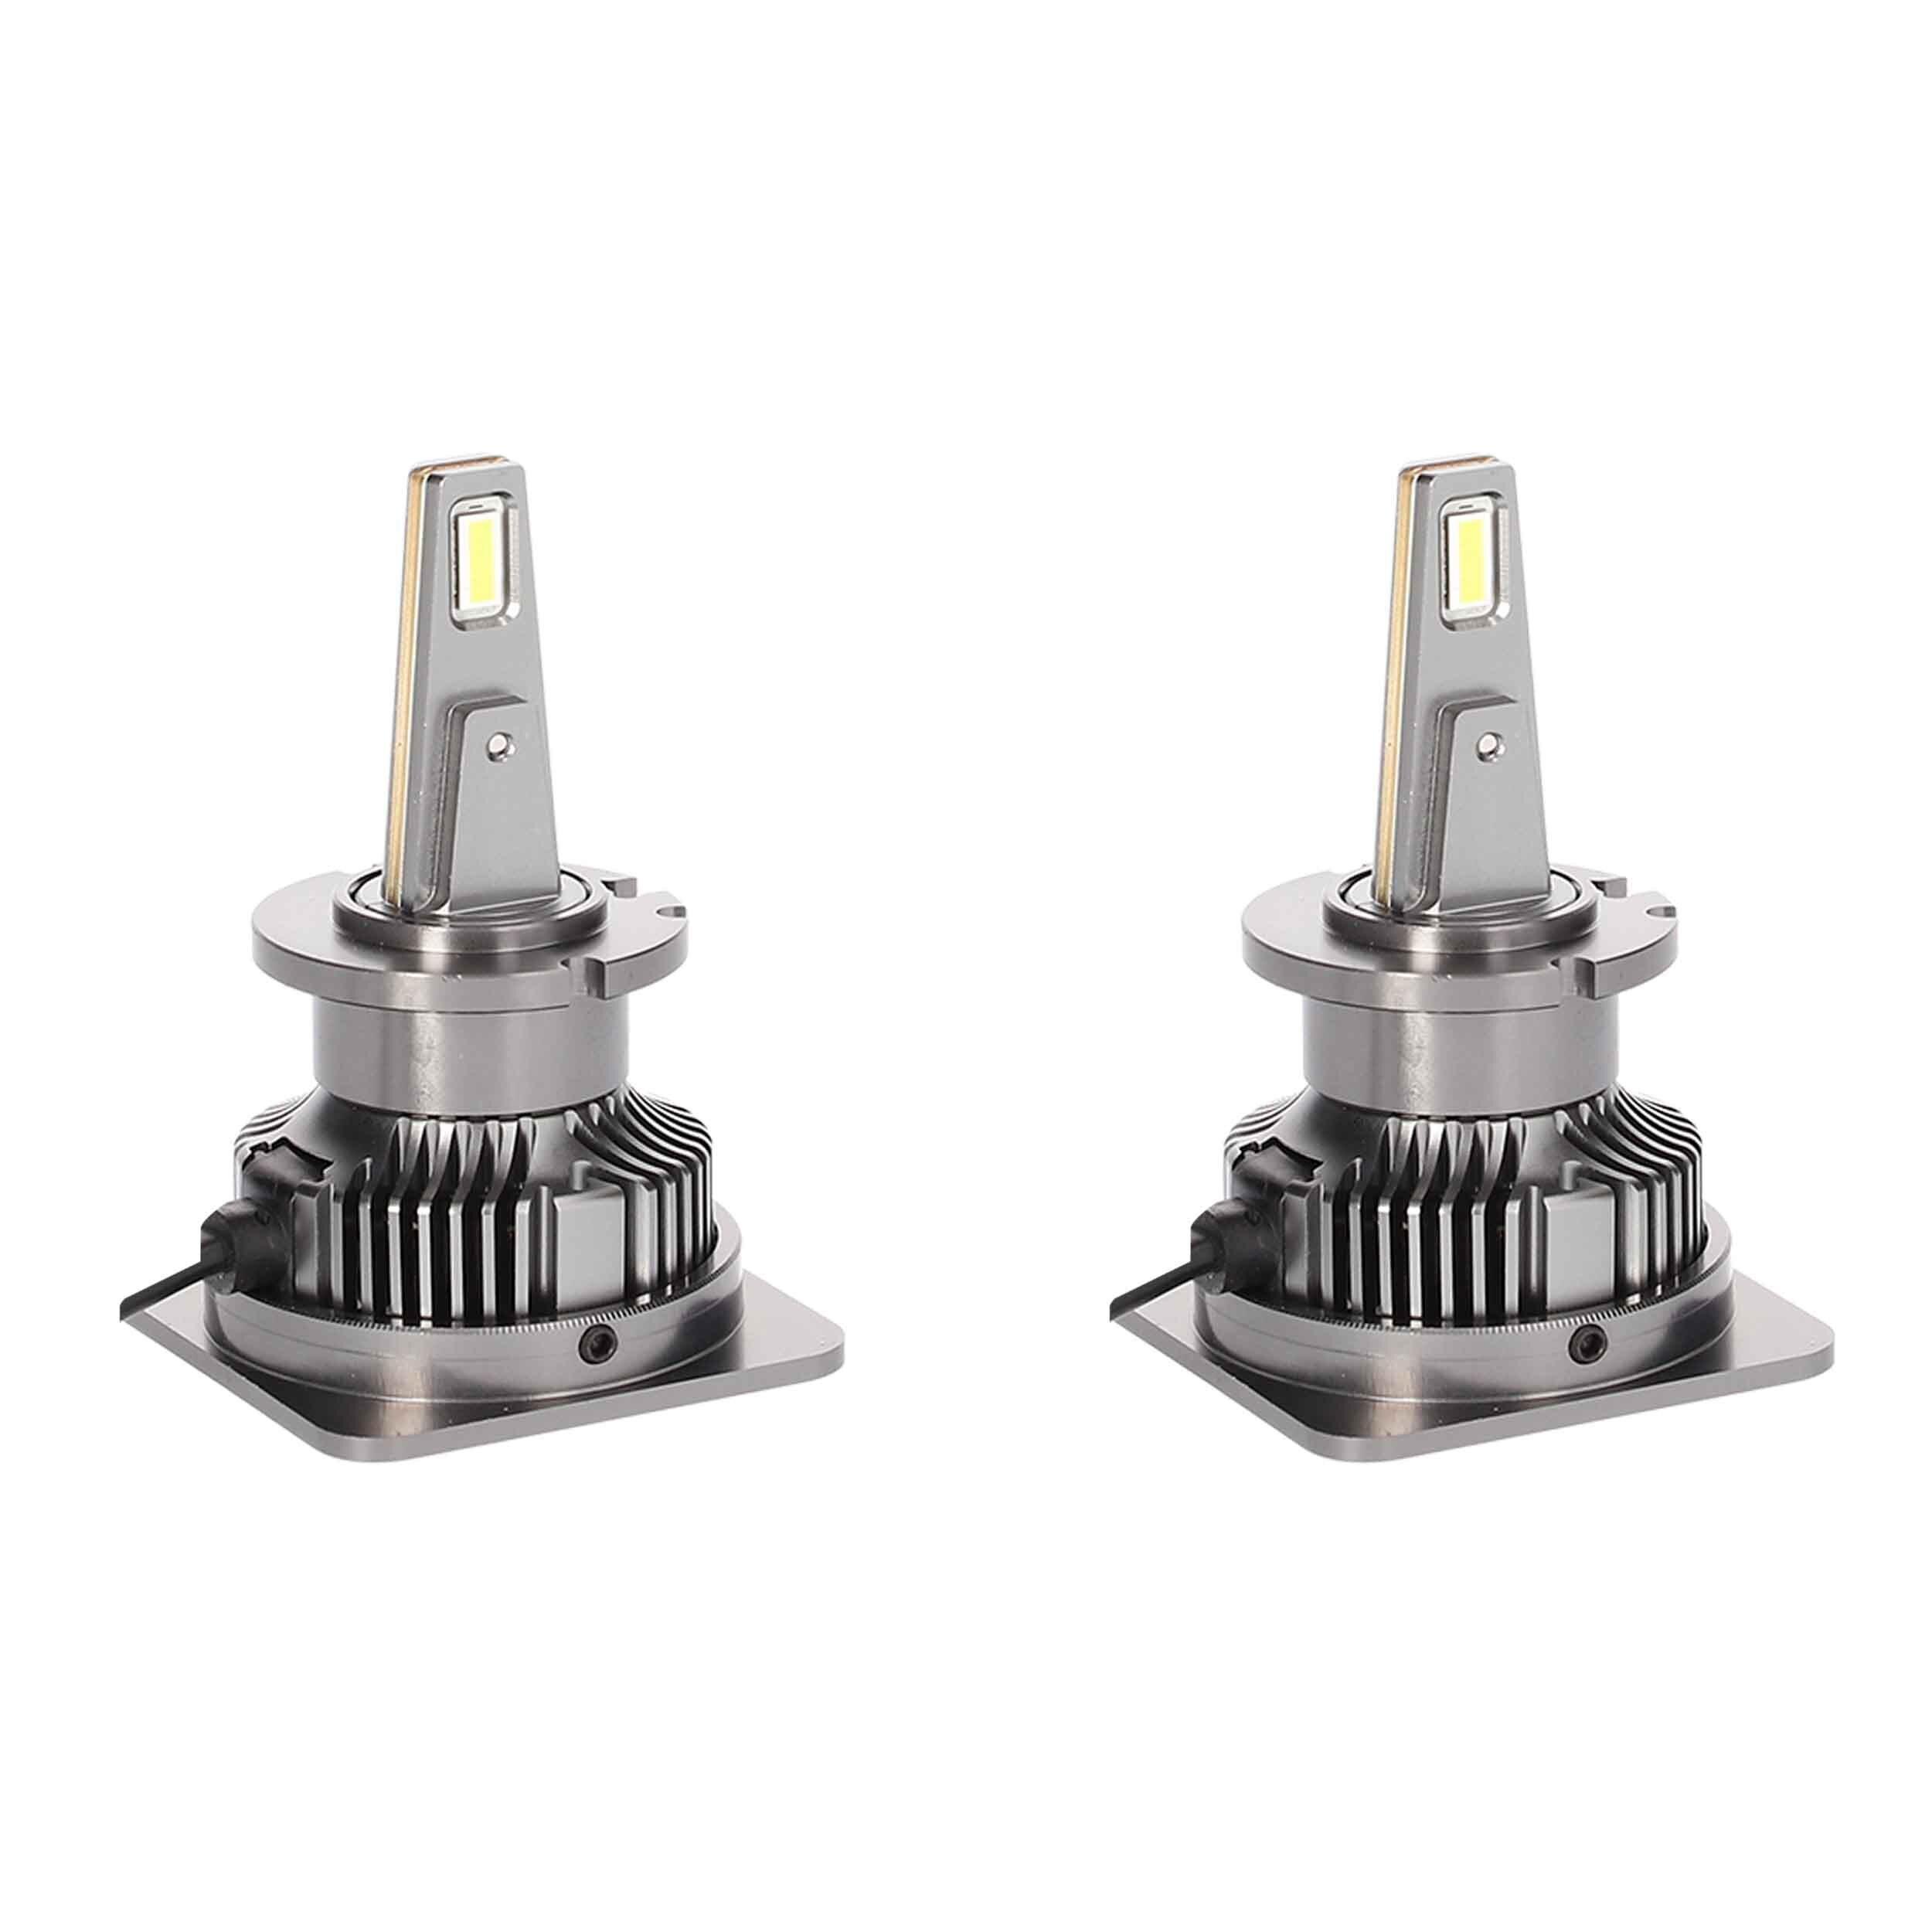 Pro Series LED Bulbs - Fits D1S, D1R